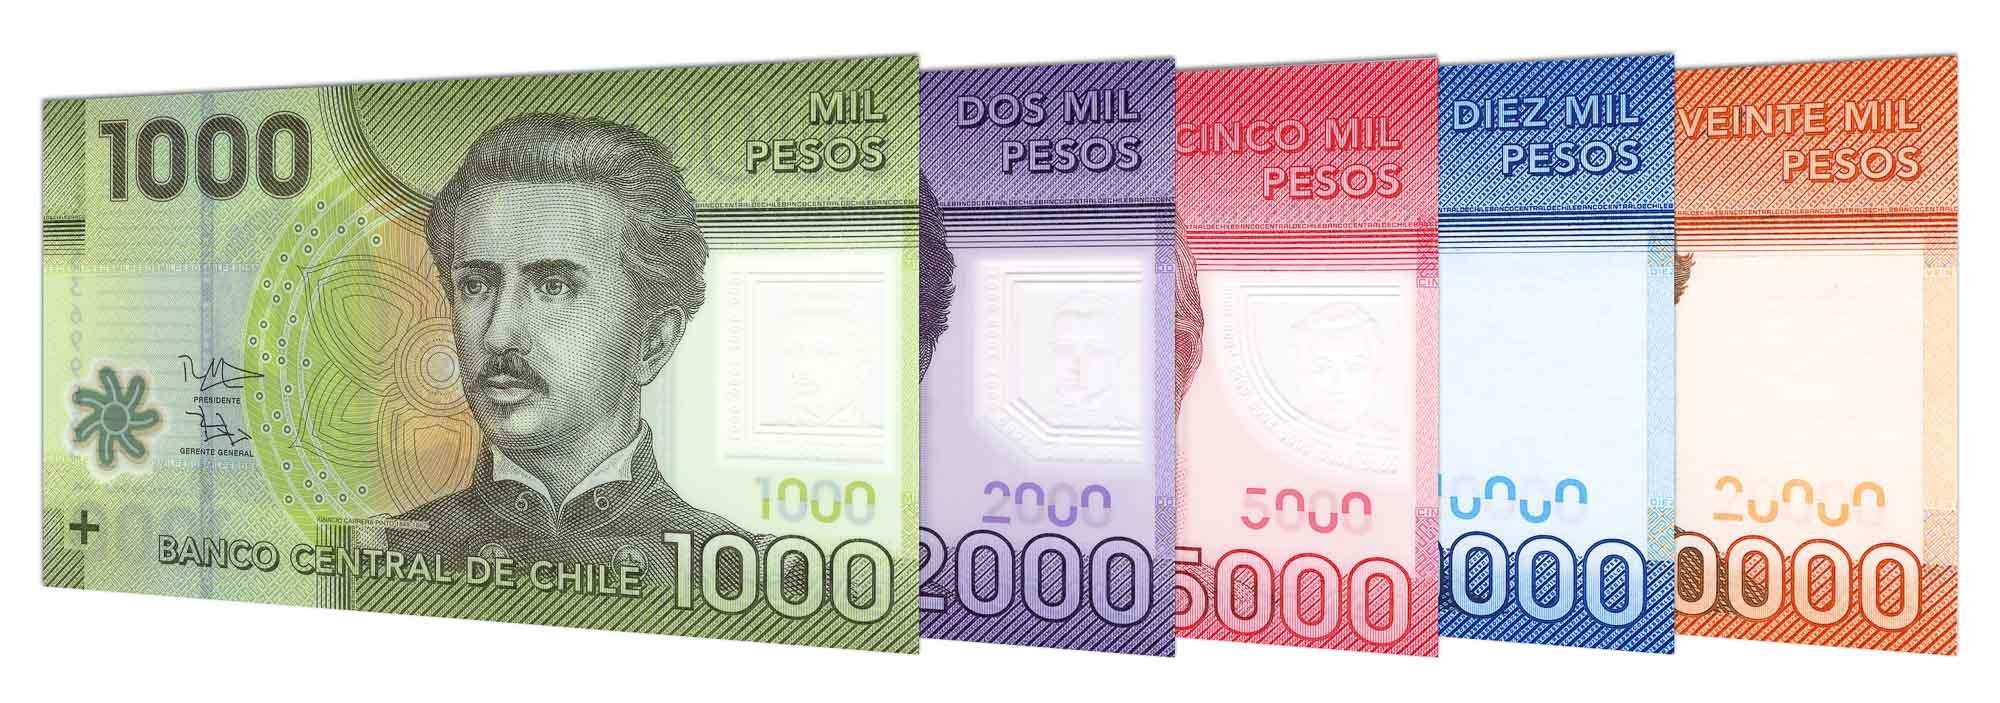 Chilean Pesos Online Clp